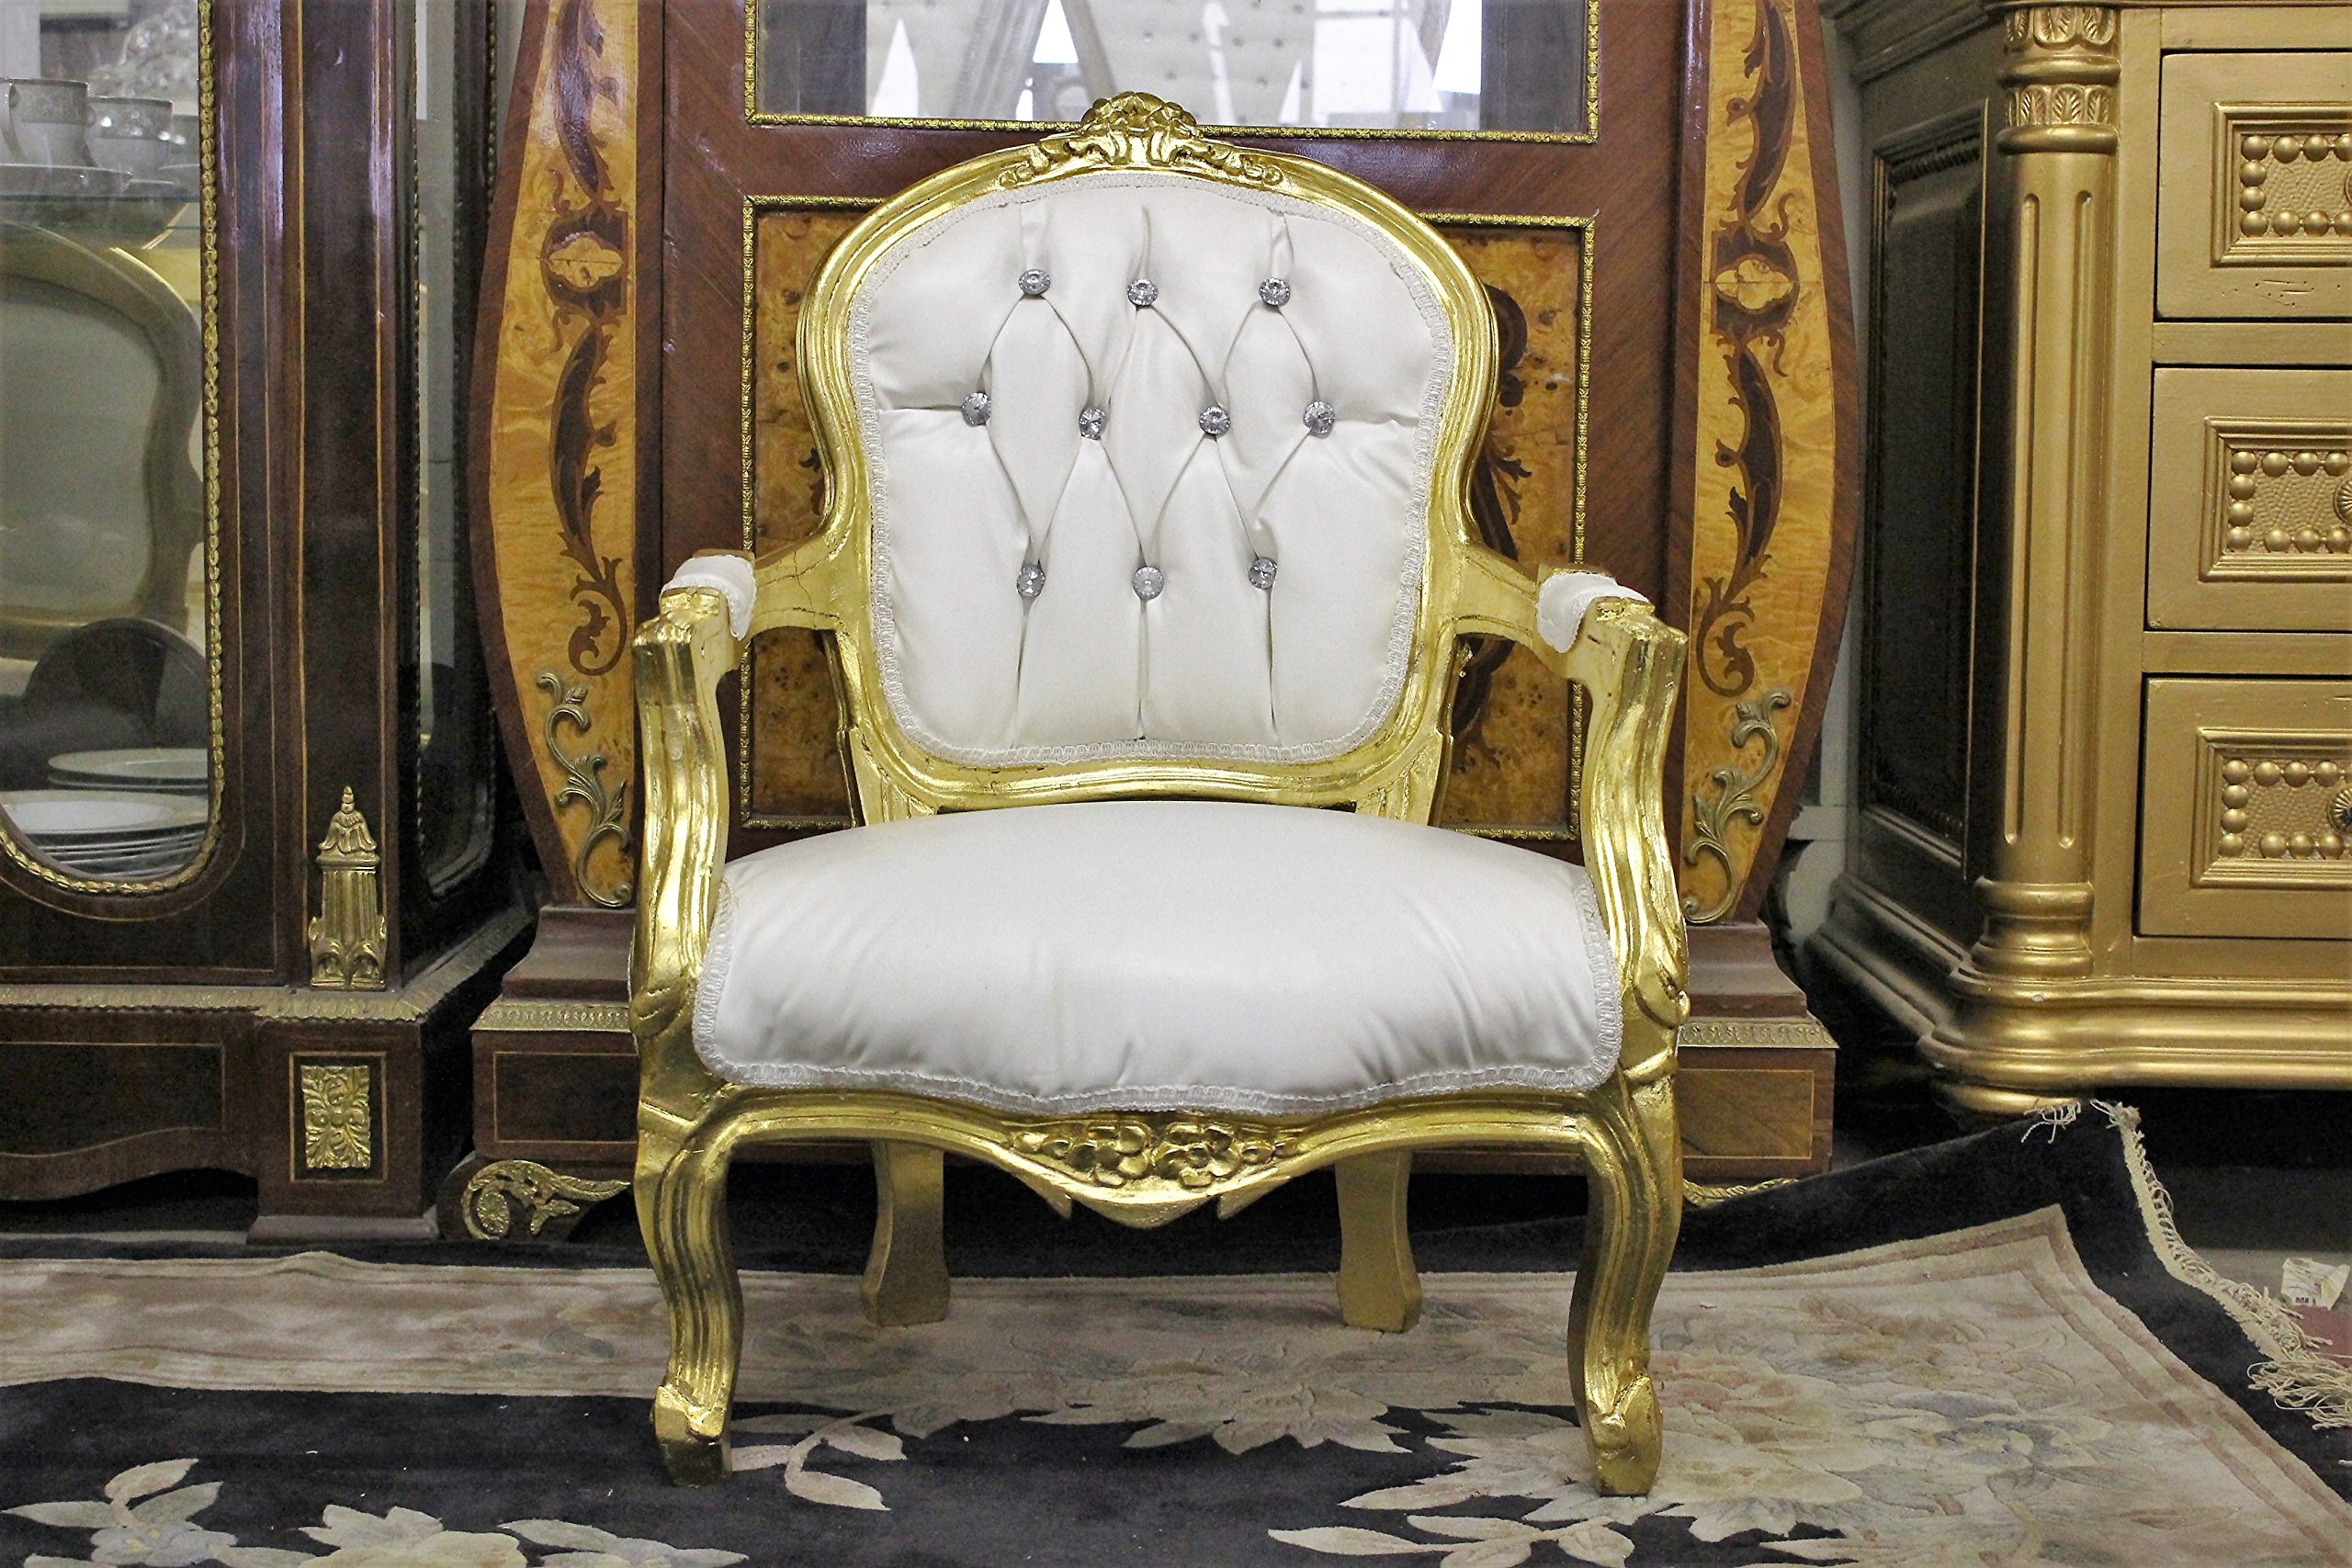 Mini ''Victoria'' Children's Throne Chair - Baby Throne - 27'' Height - Gold by Throne Kingdom